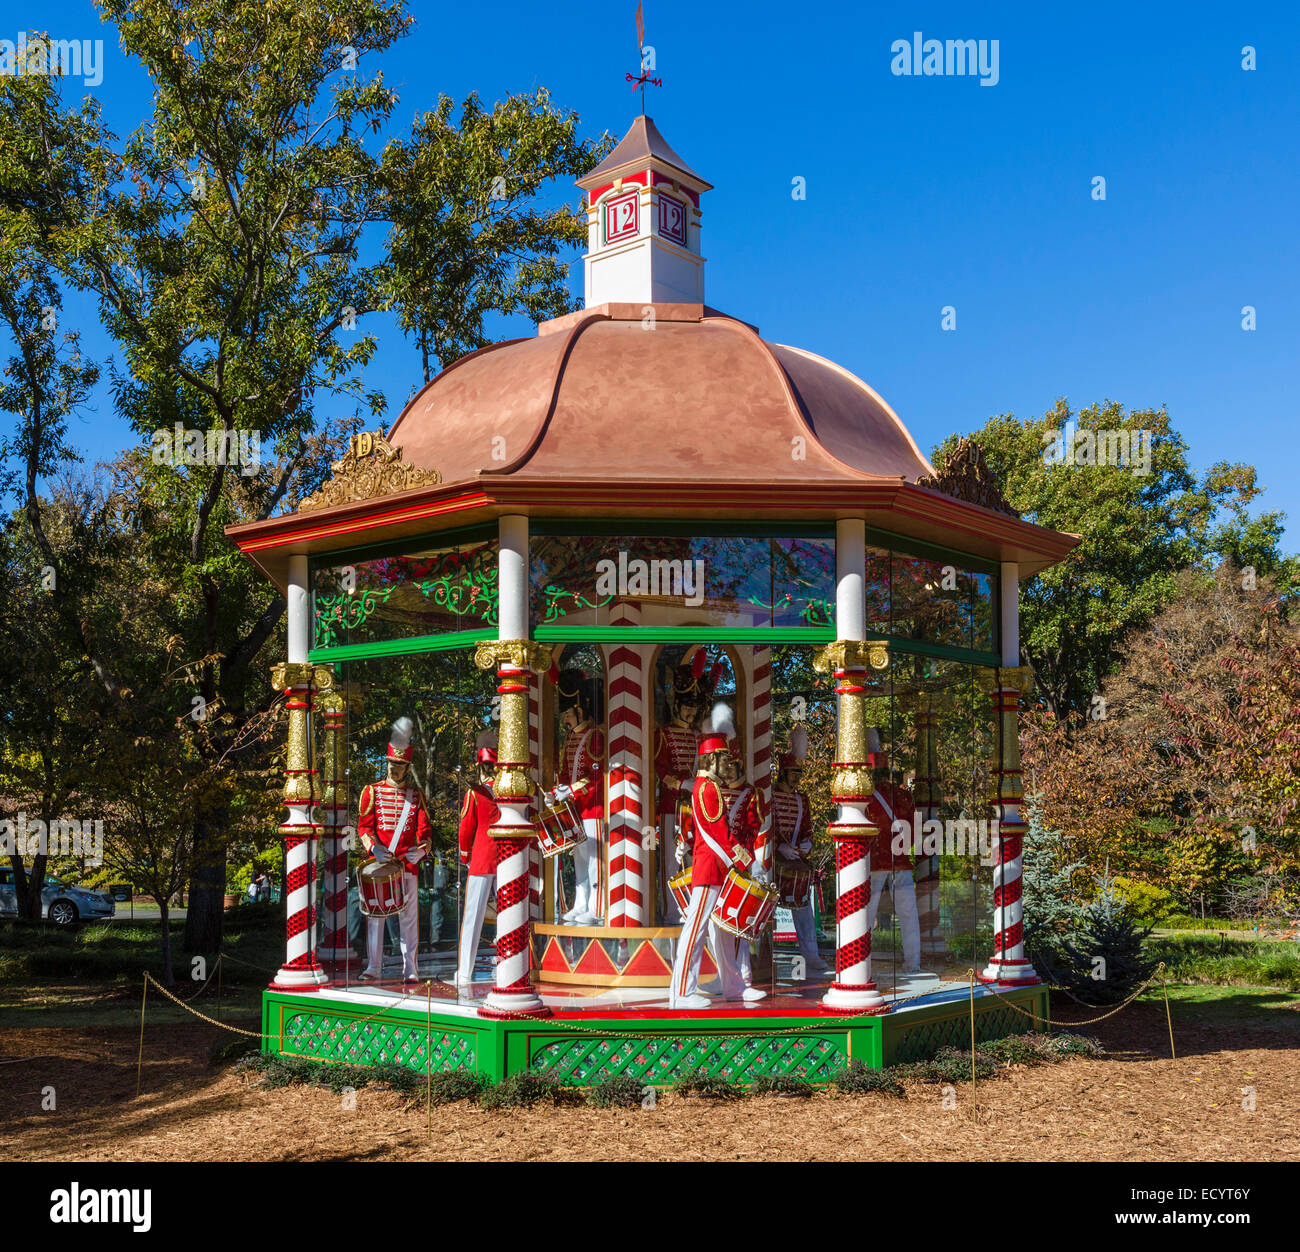 Twelve Drummers Drumming gazebo, part of The 12 Days of Christmas exhibit, Dallas Arboretum and Botanical Garden, - Stock Image